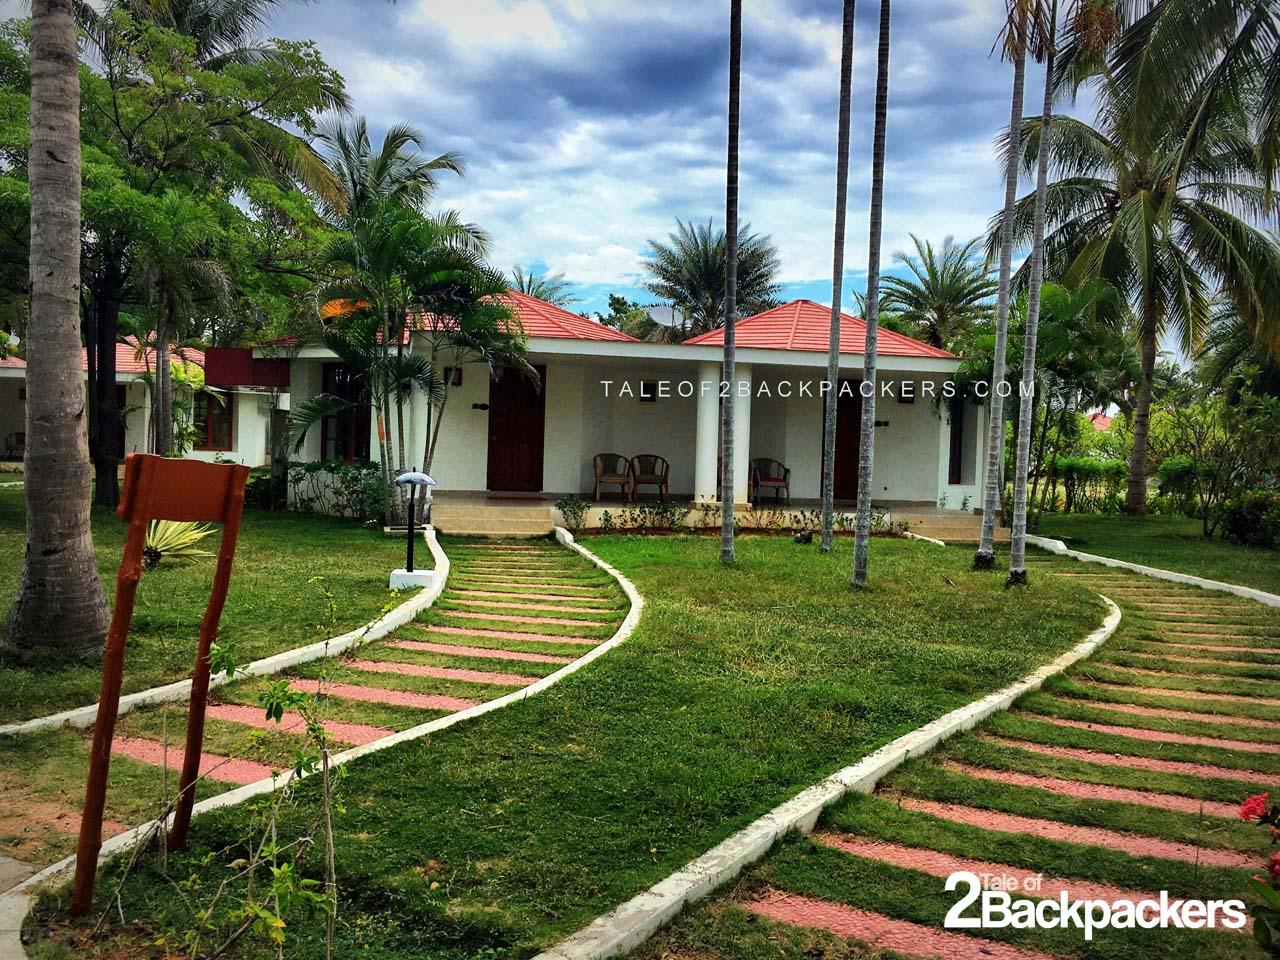 Chariot Beach Resort, Mahabalipuram | Tale of 2 Backpackers